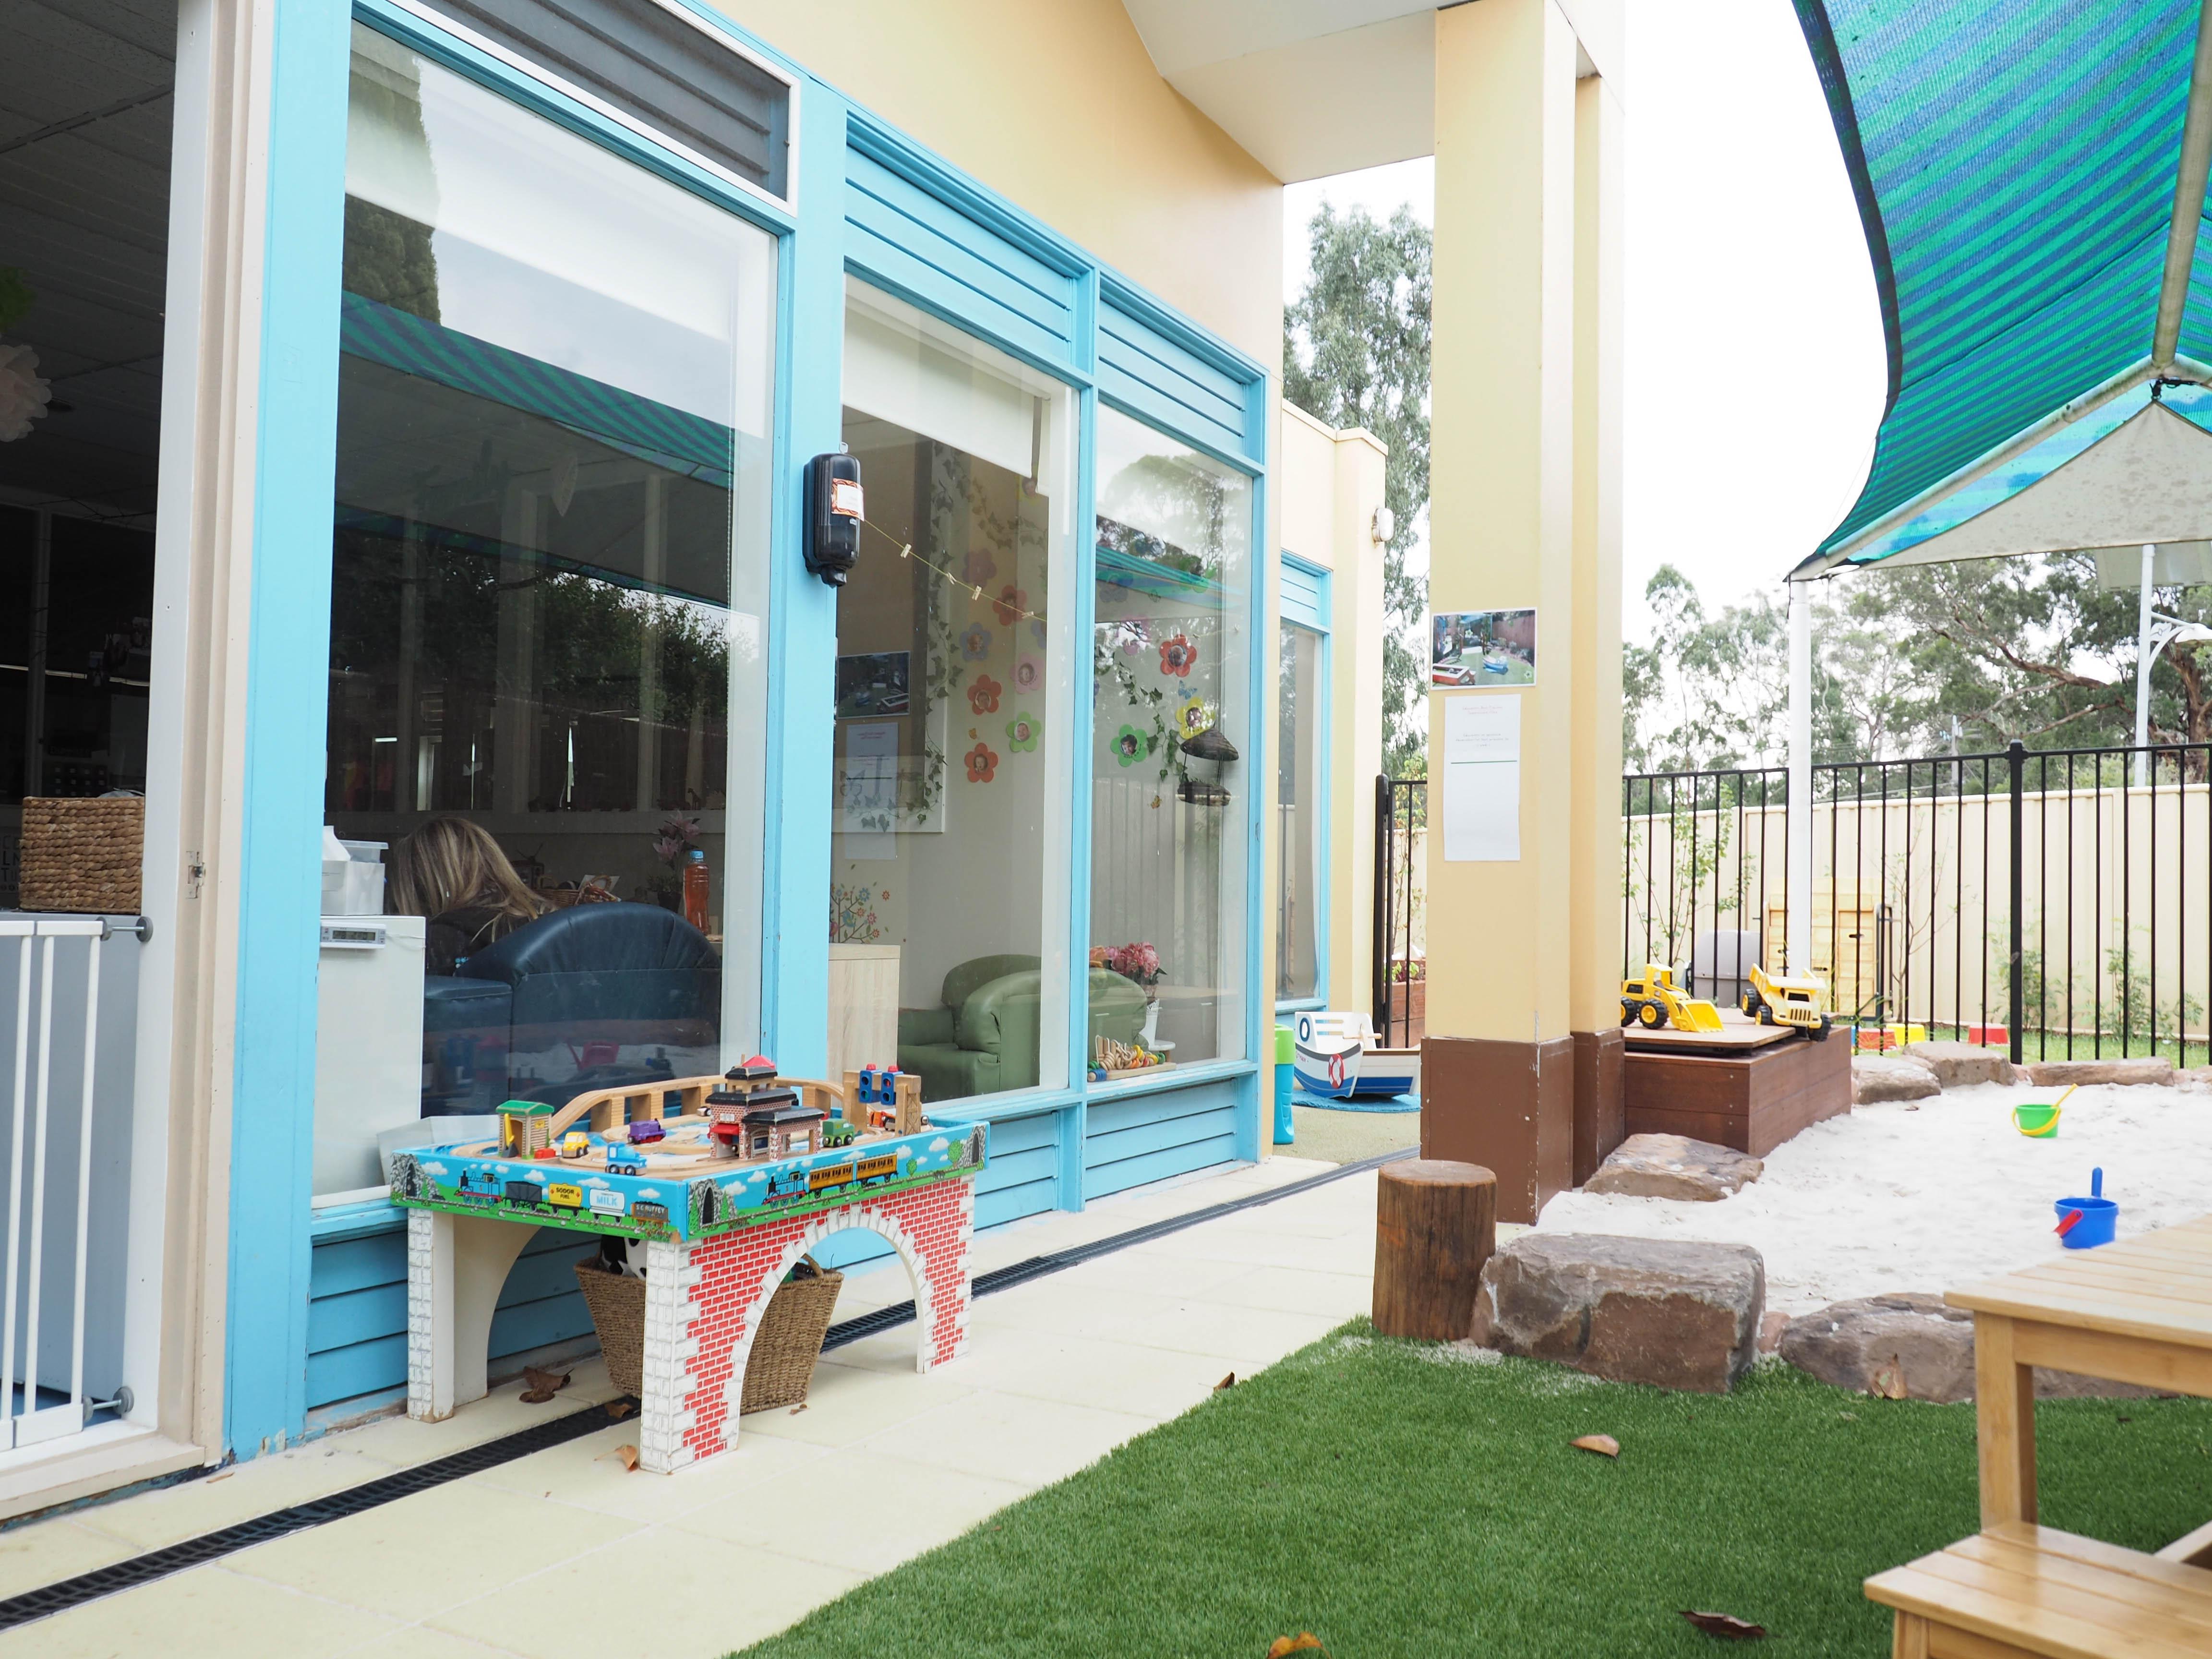 Imagine Childcare And Kindergarten Templestowe   1 Niland Rise, TEMPLESTOWE, Victoria 3106   +61 3 9846 3425